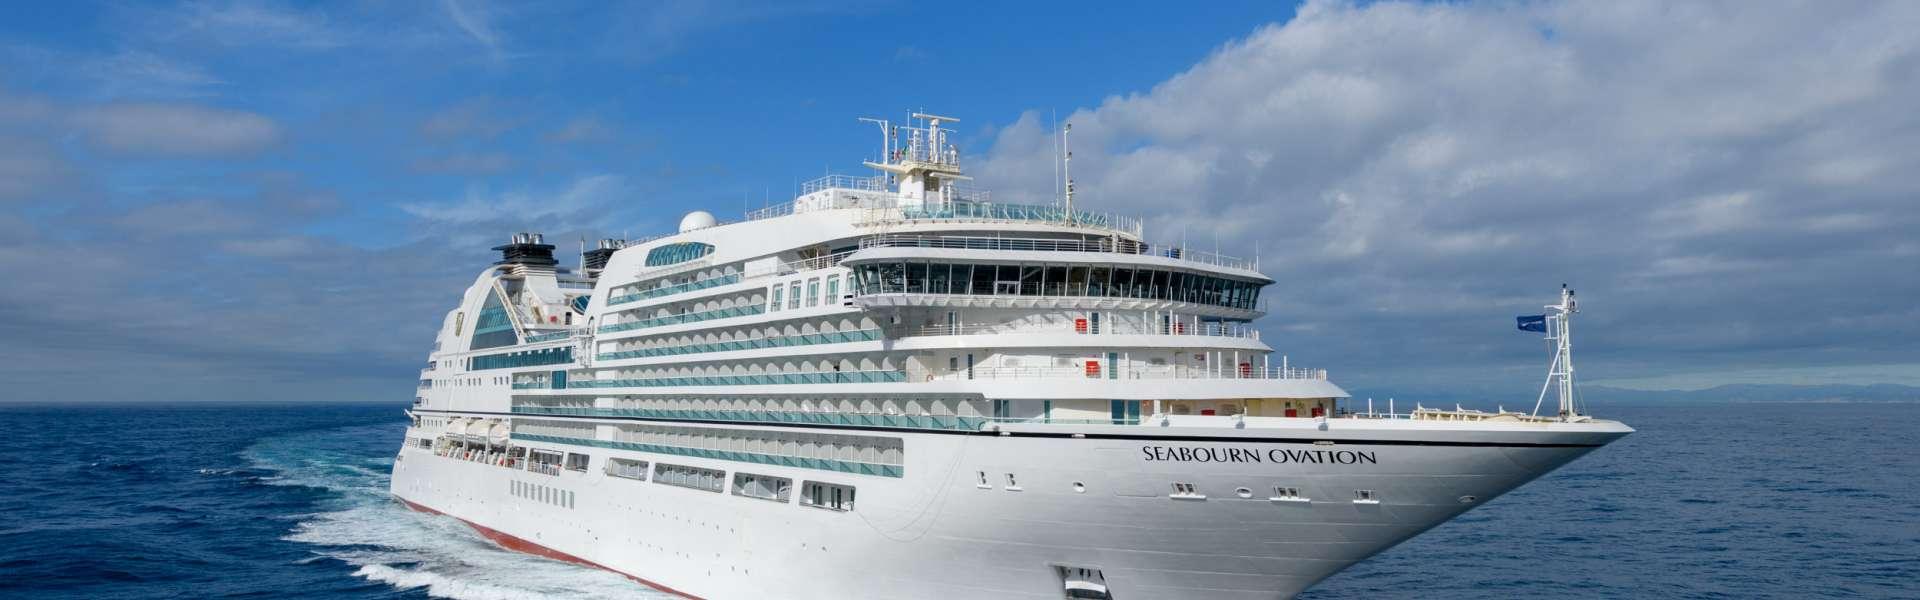 Croaziera 2019 - Mediterana de Vest (Atena/Piraeus) - Seabourn - Seabourn Ovation - 8 nopti